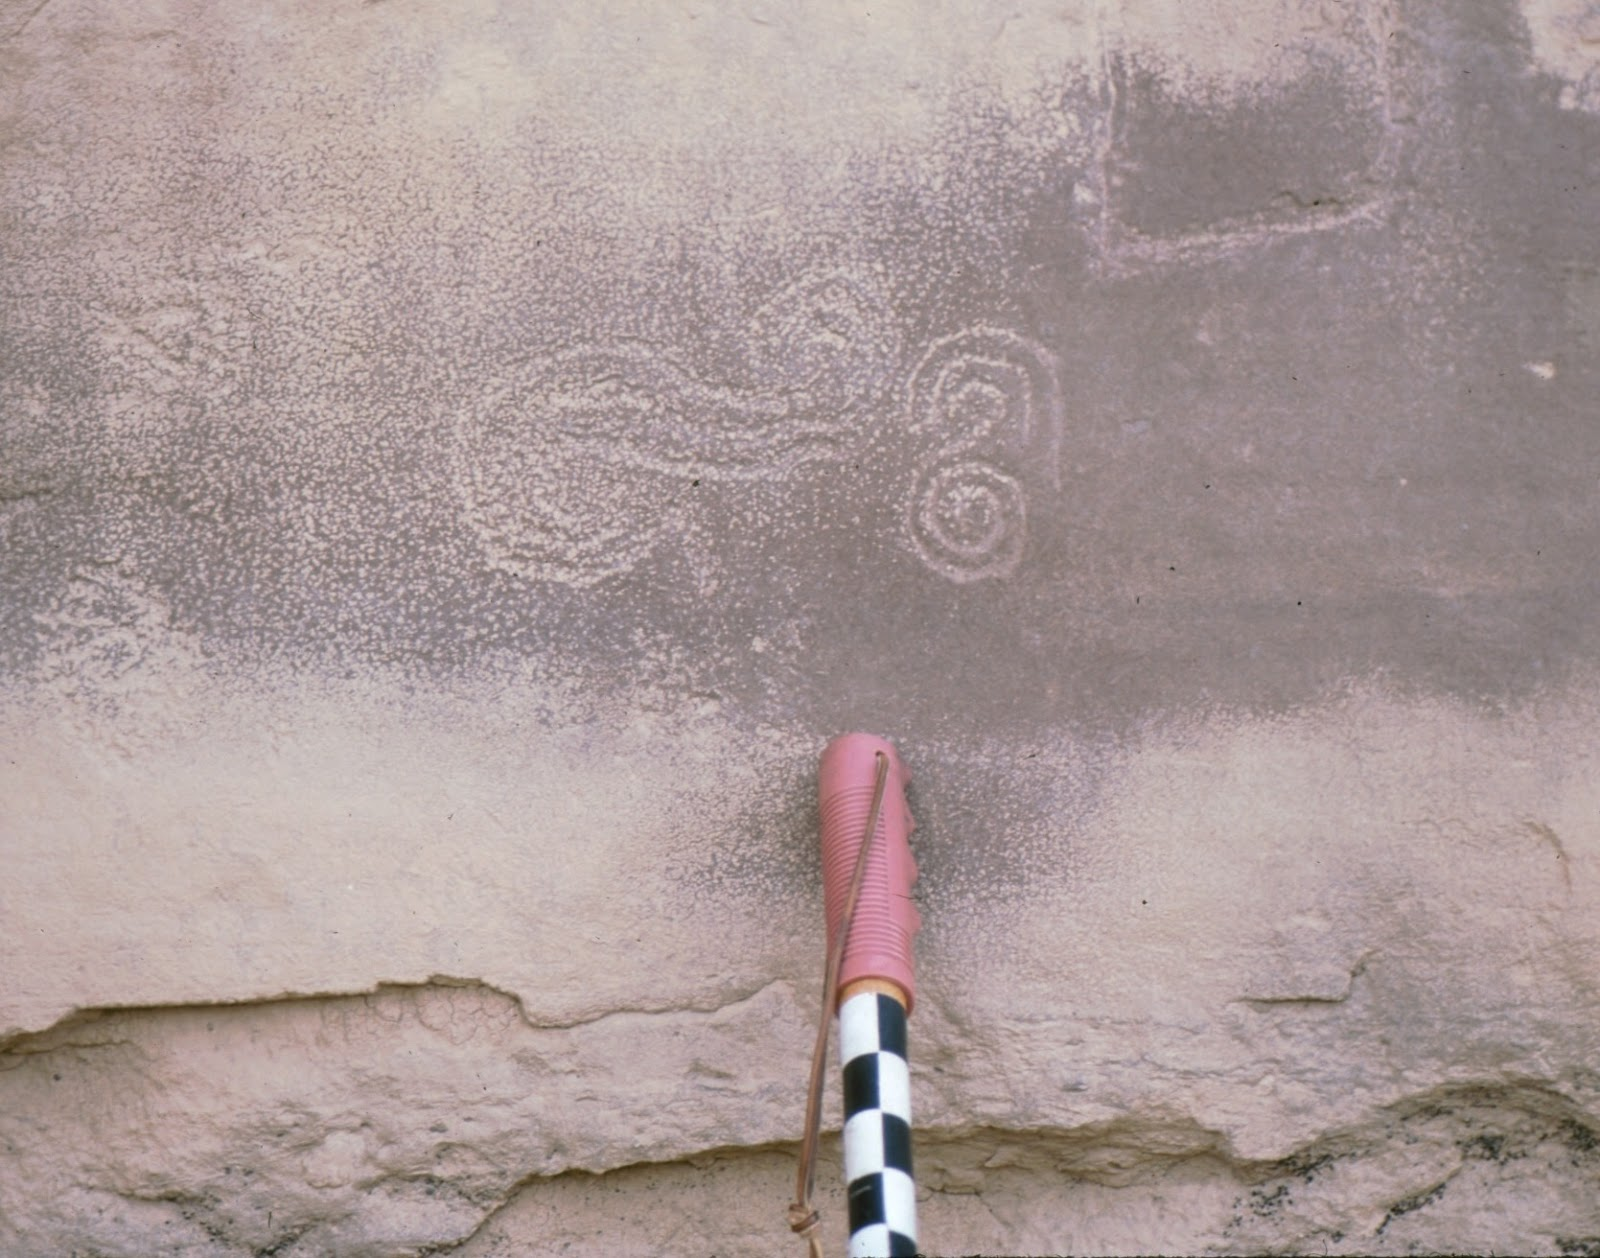 Rock art blog wind symbols in rock art of chaco canyon wind symbols in rock art of chaco canyon biocorpaavc Image collections